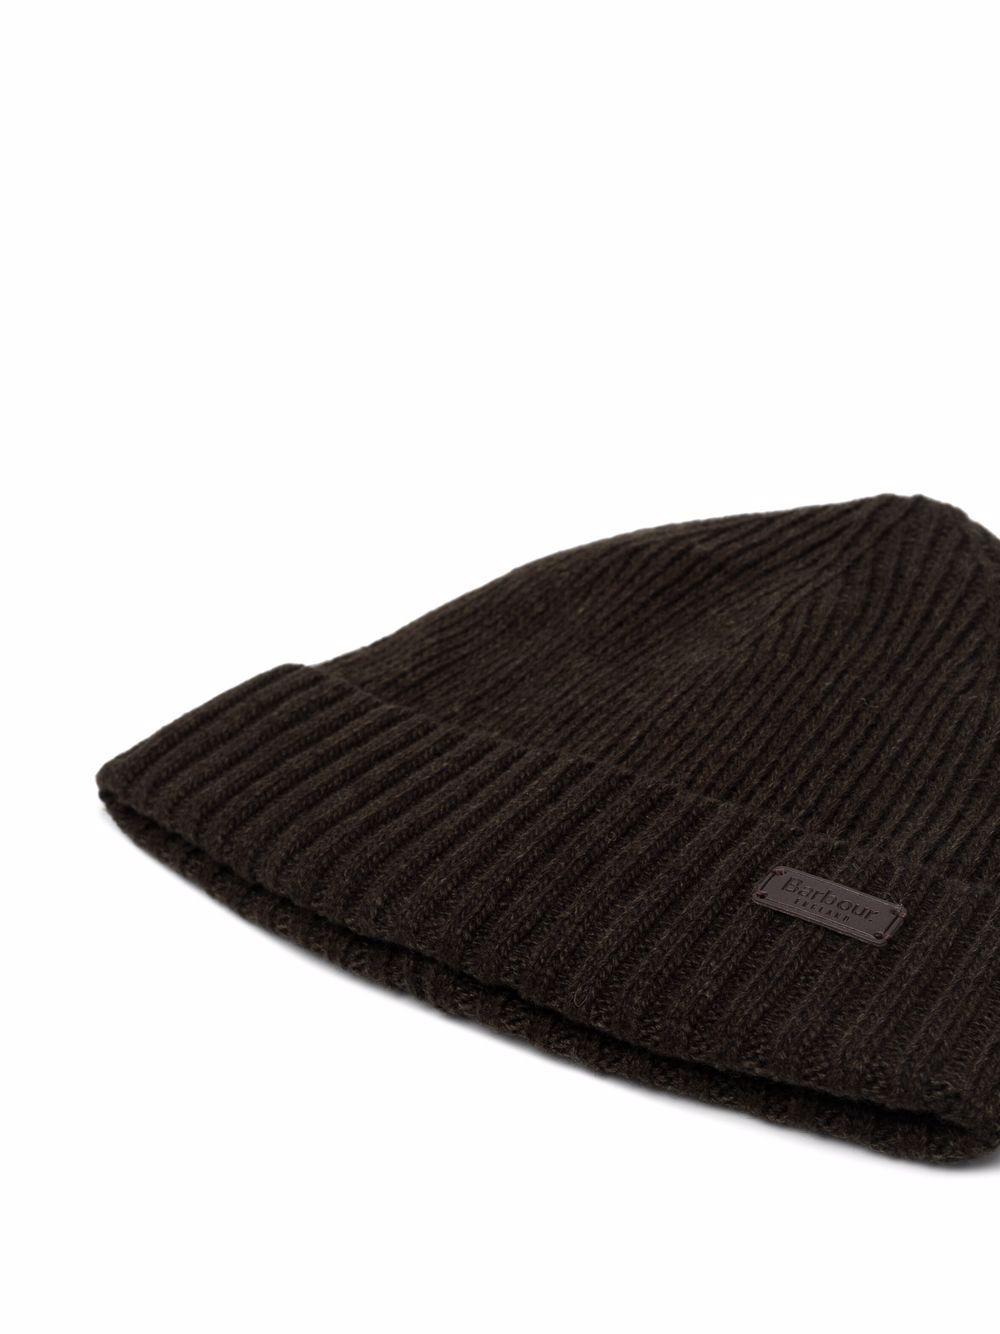 carloton hat man black BARBOUR   Hats   MHA0449GN91